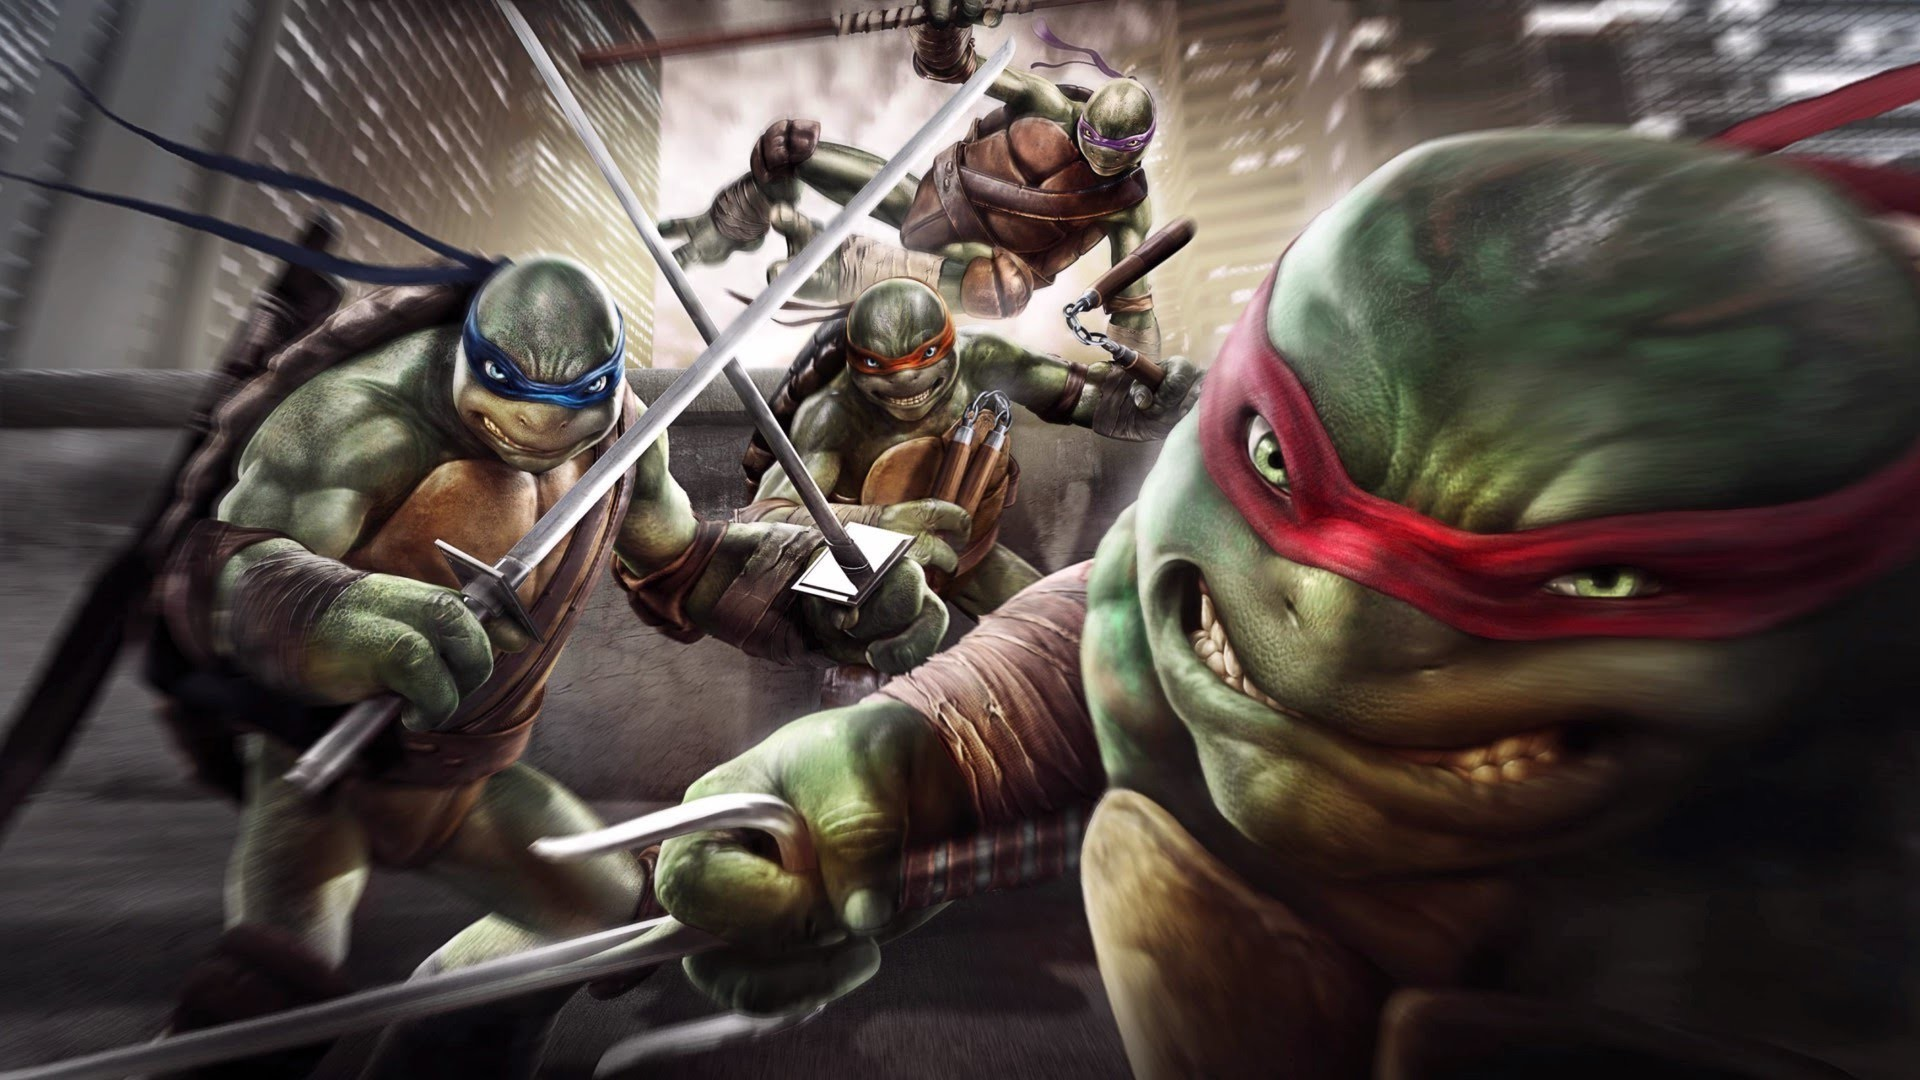 Res: 1920x1080, Découverte | Teenage Mutant Ninja Turtles: Attention au mutagène - YouTube